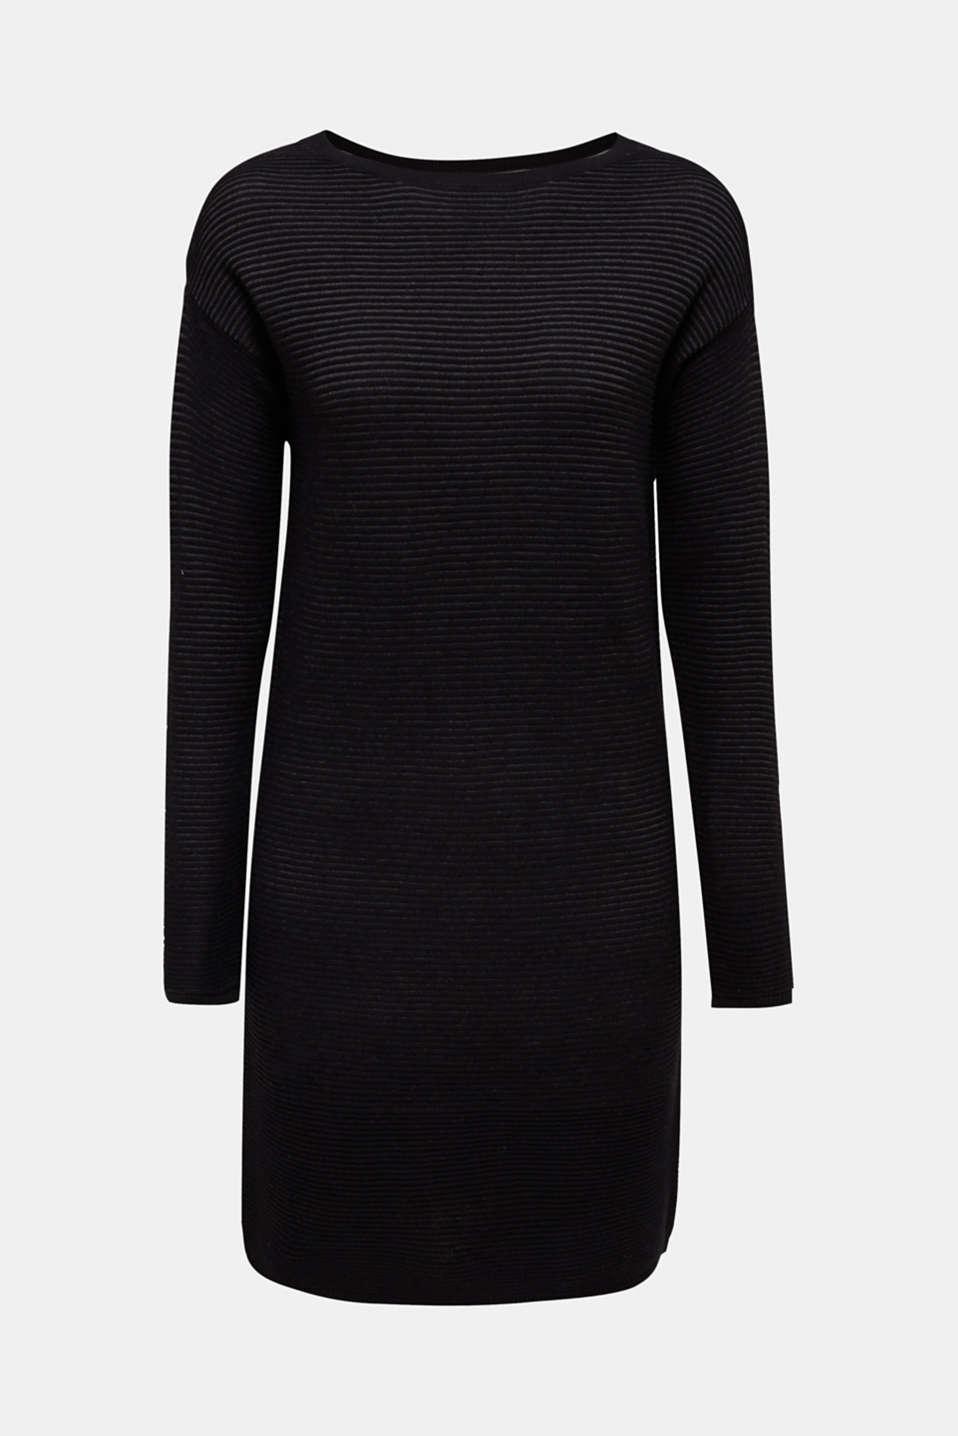 Rib knit dress, 100% cotton